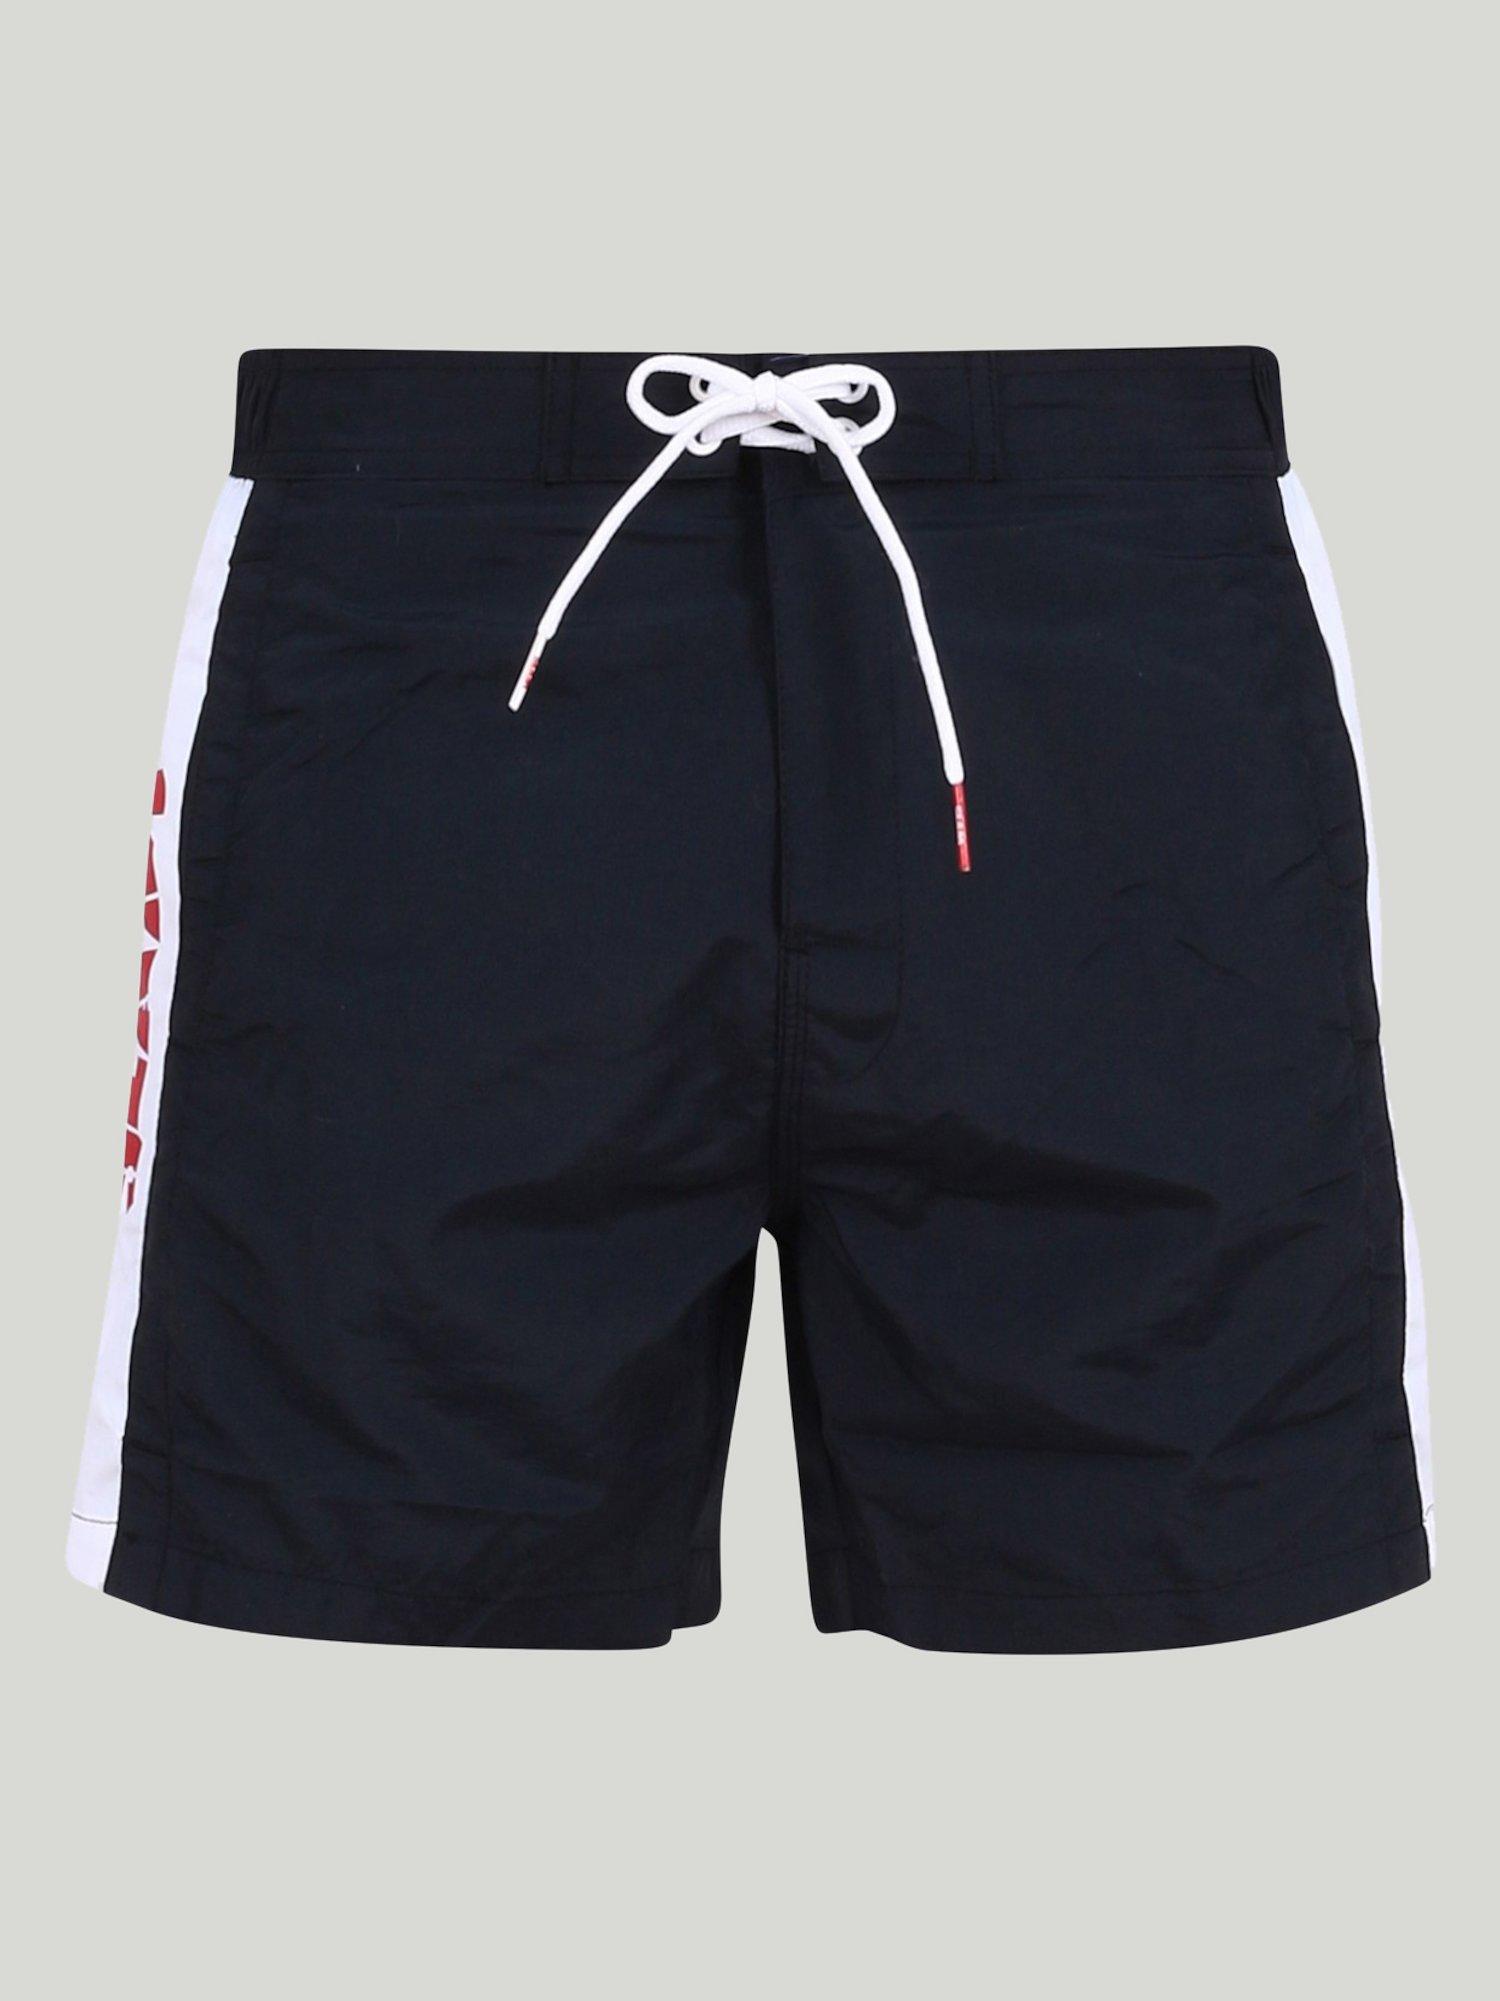 Paxos swimsuit - Navy